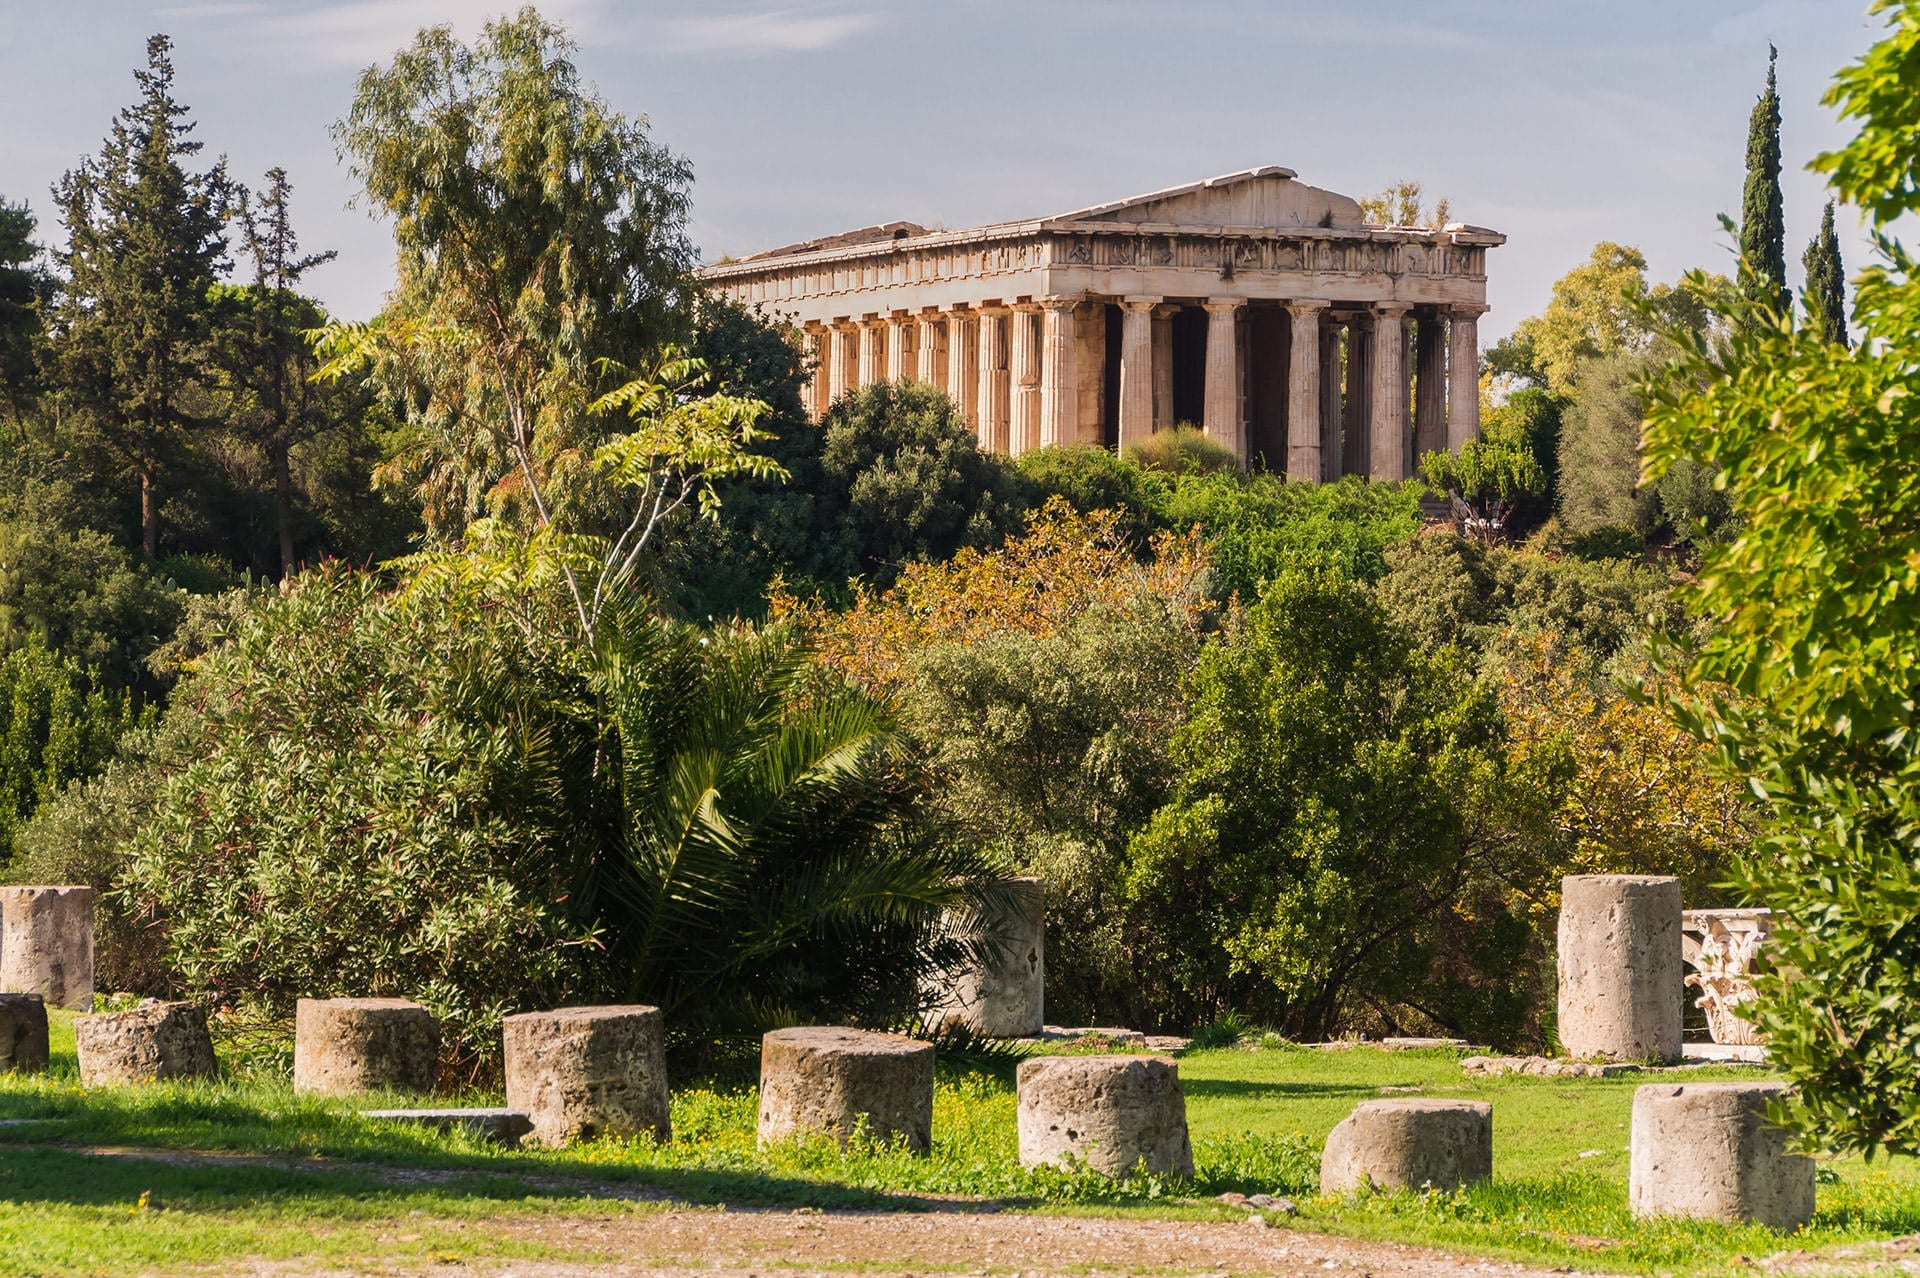 Acropolis of Athens and Ancient Agora tour